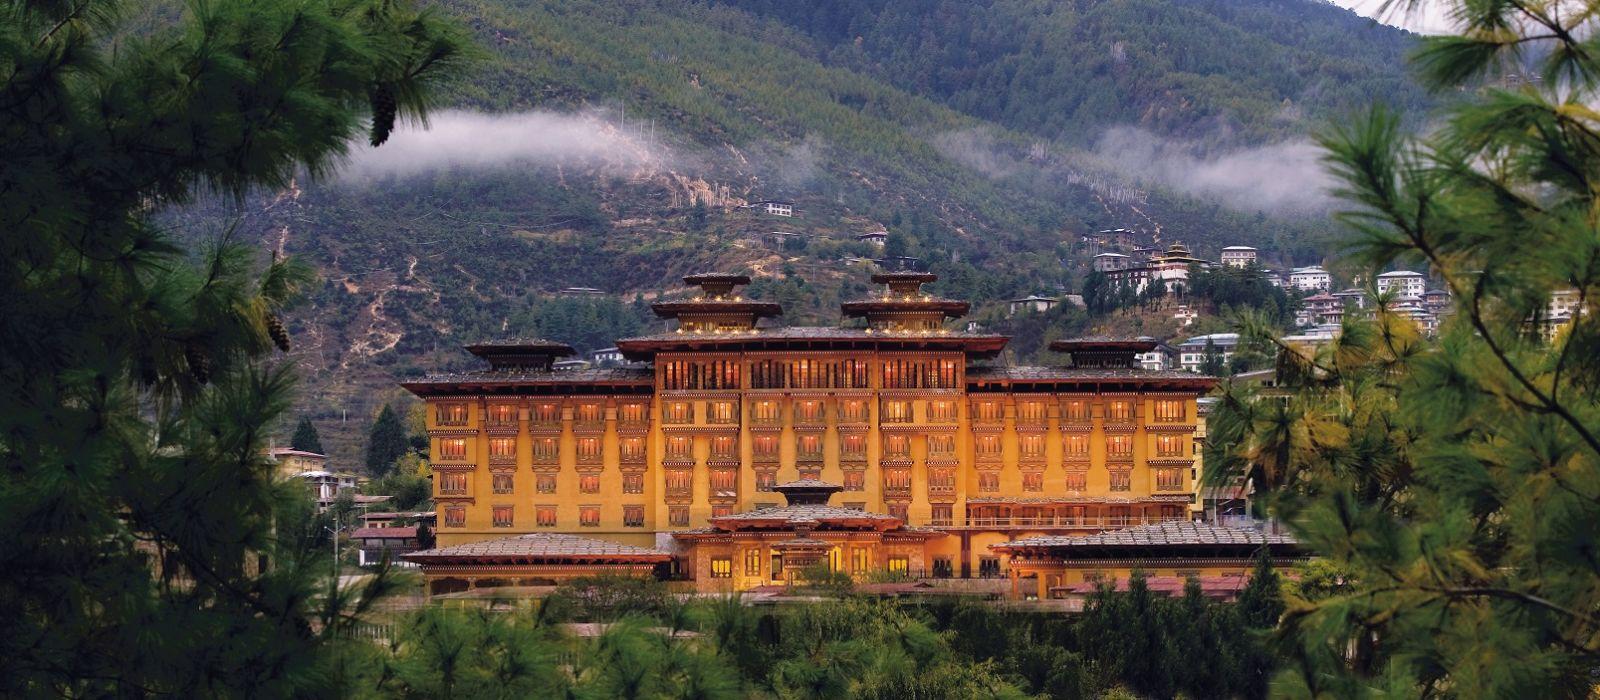 Exklusive Bhutan Luxusreise Urlaub 4